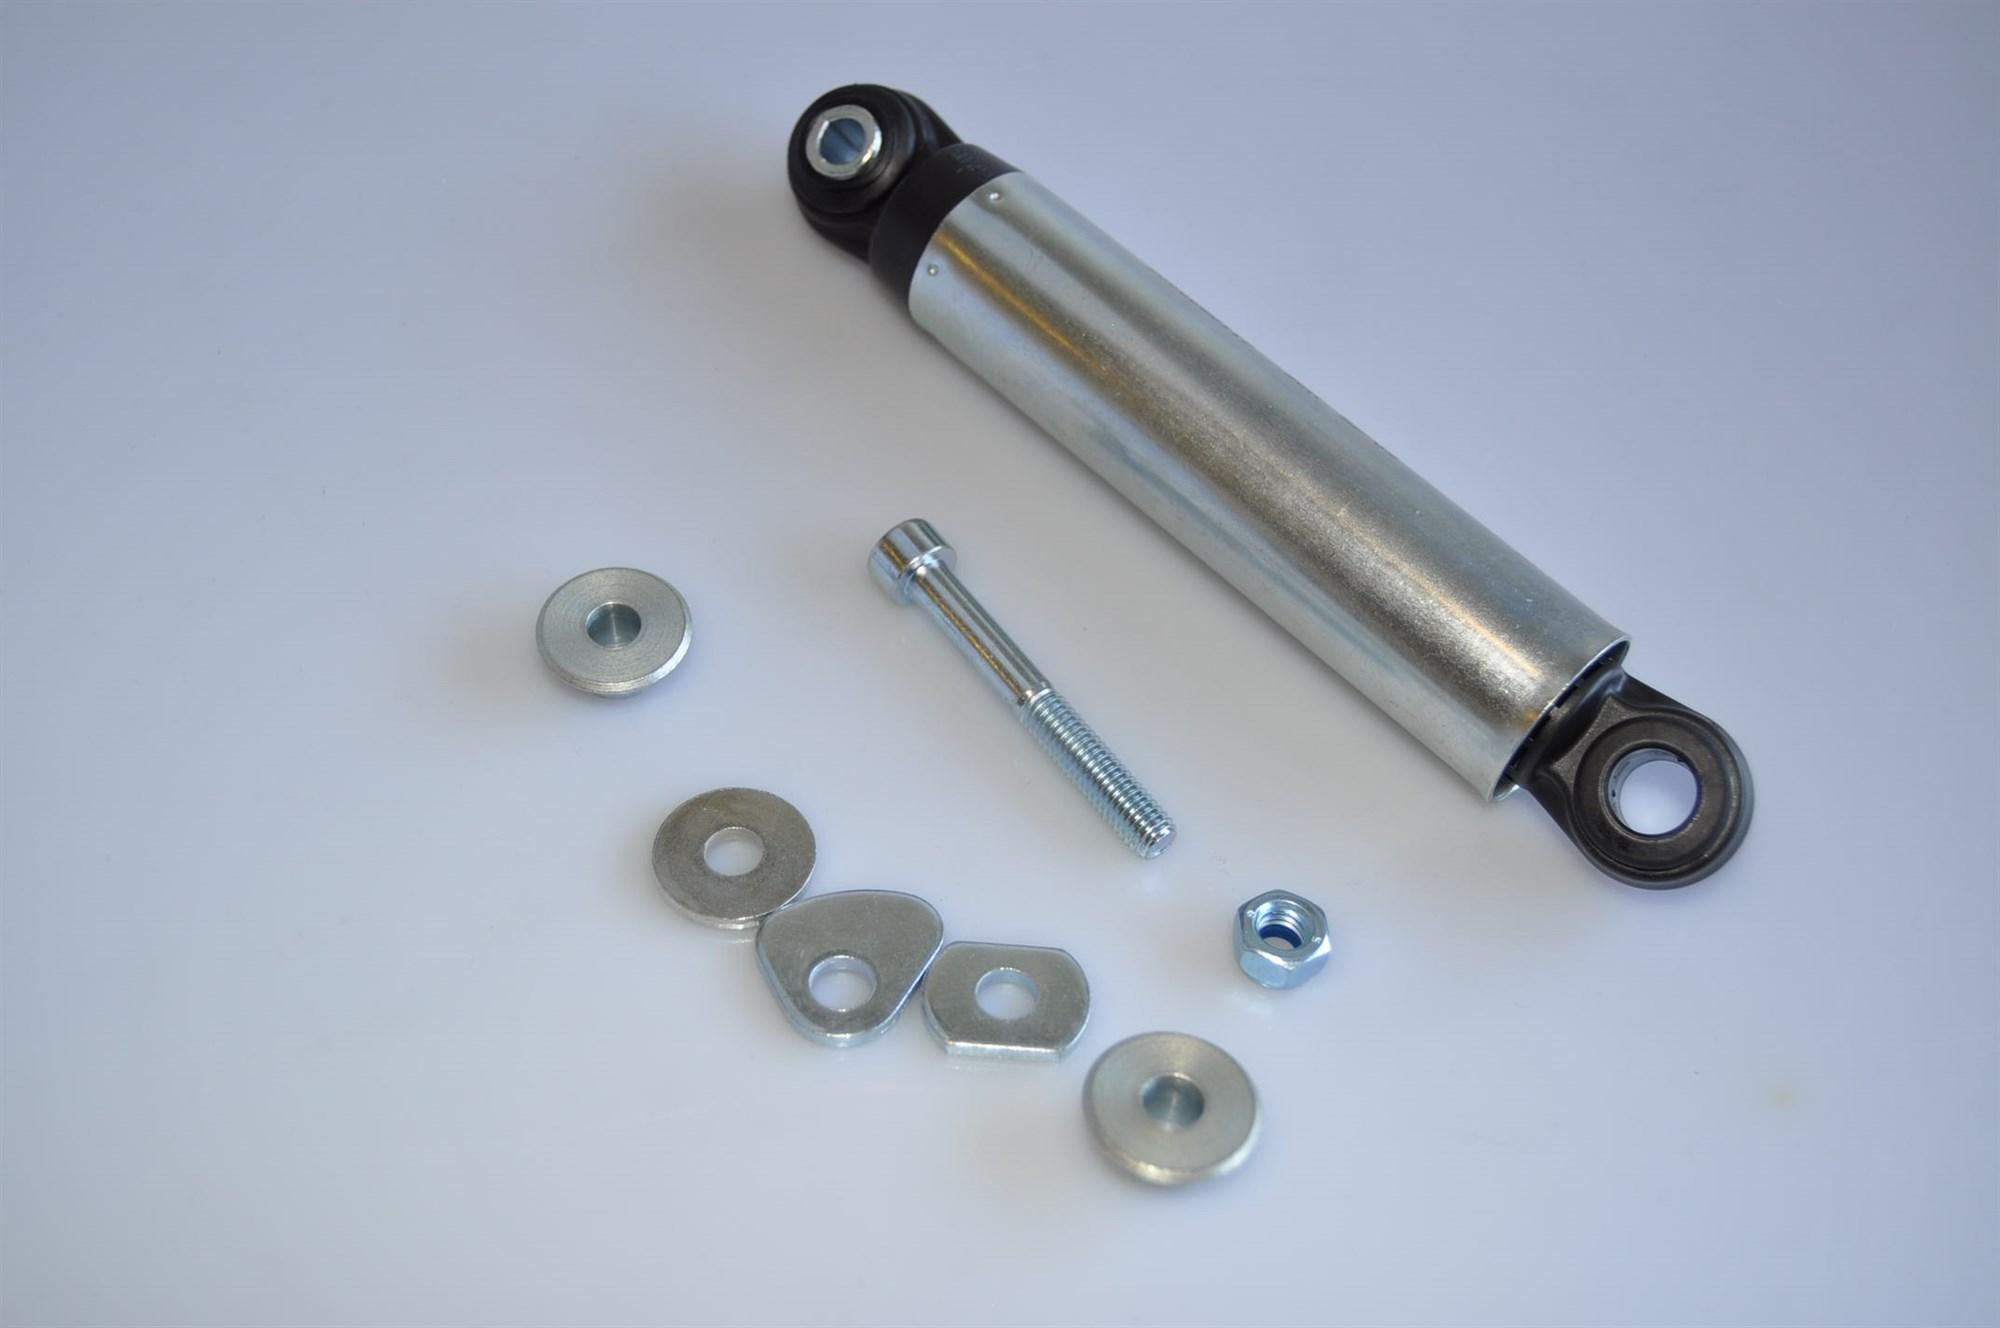 Kühlschrank Vibrationsdämpfer : Stoßdämpfer bosch waschmaschine